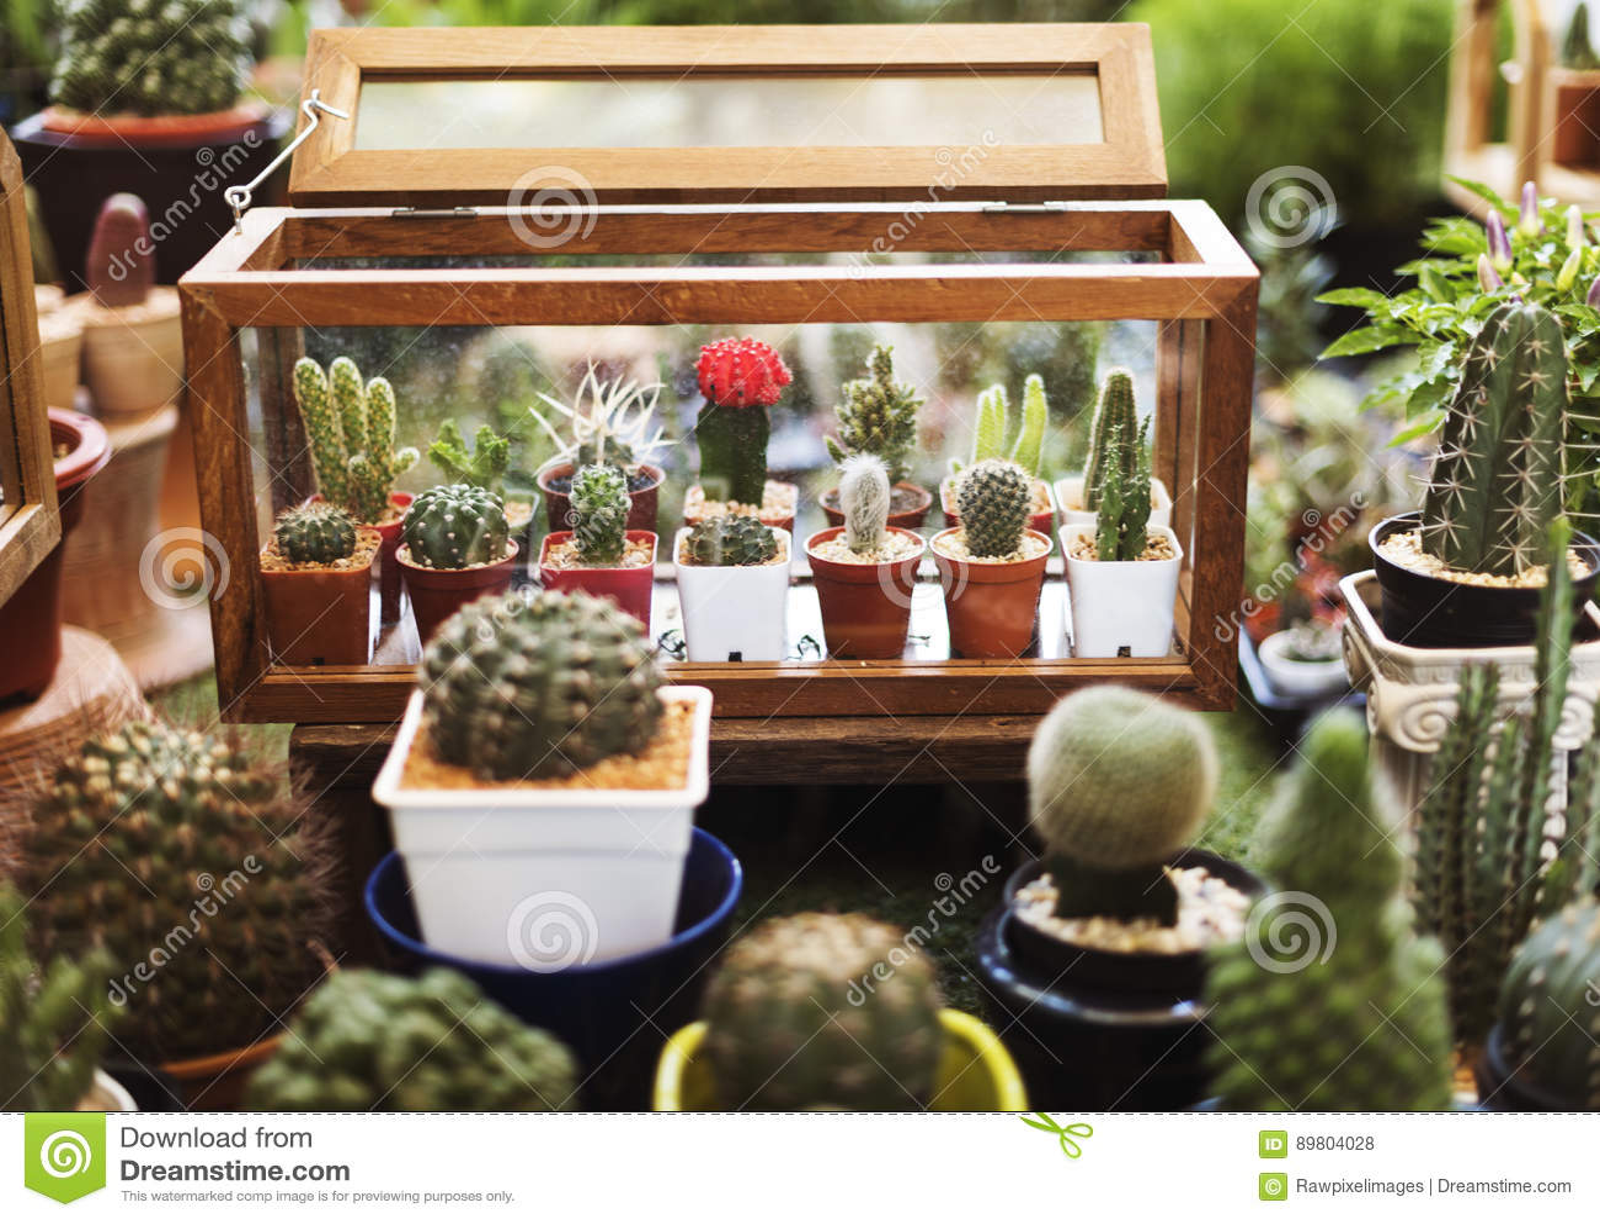 Cactus Houseplant Collection Decoration Set Stock Photo Image Of